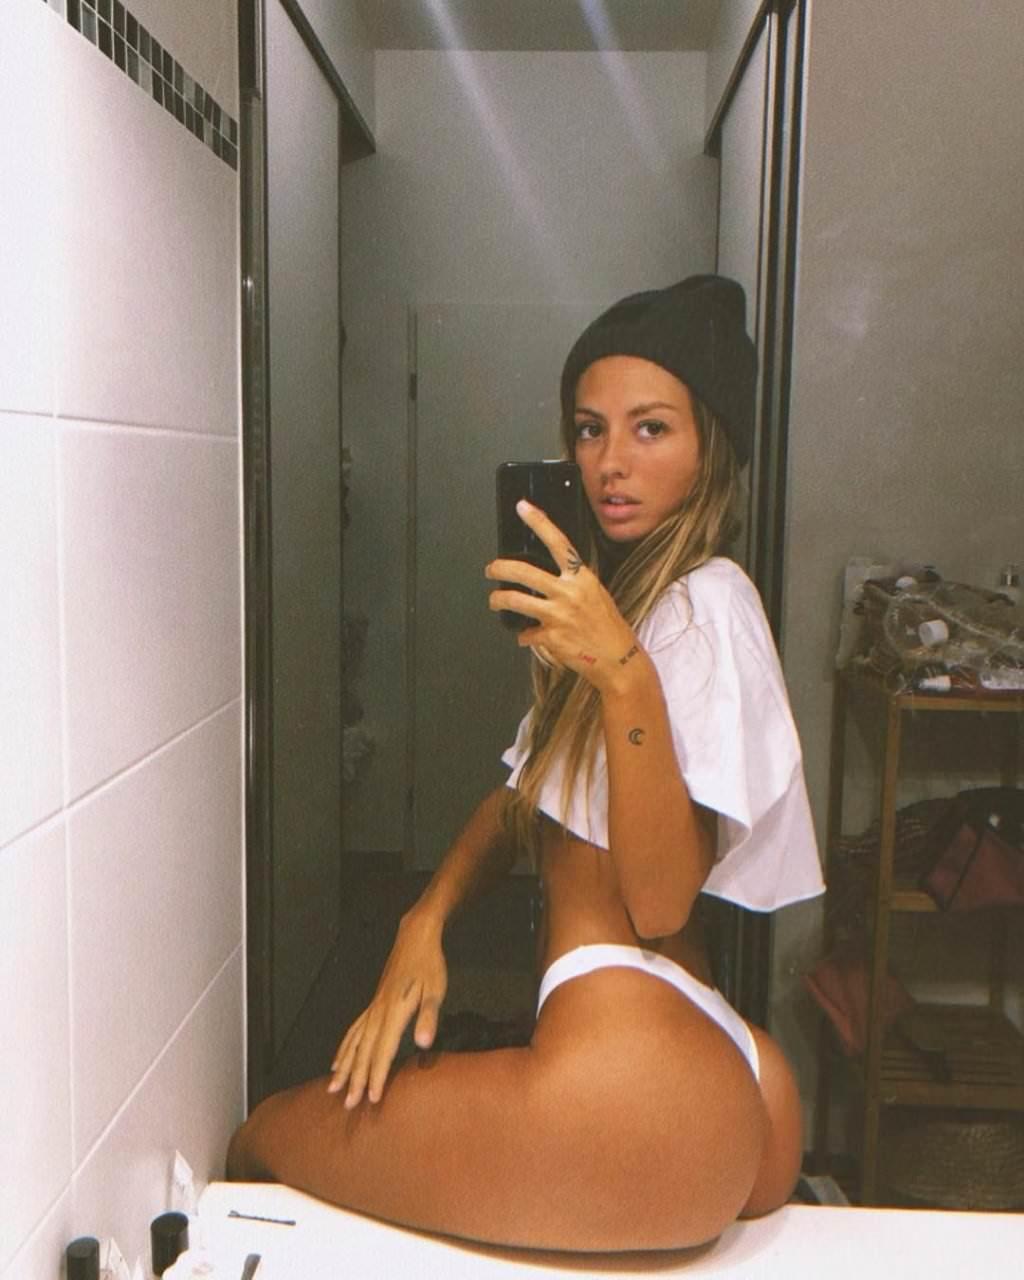 Pauline Tantot Nude Onyfans Leaked 0251